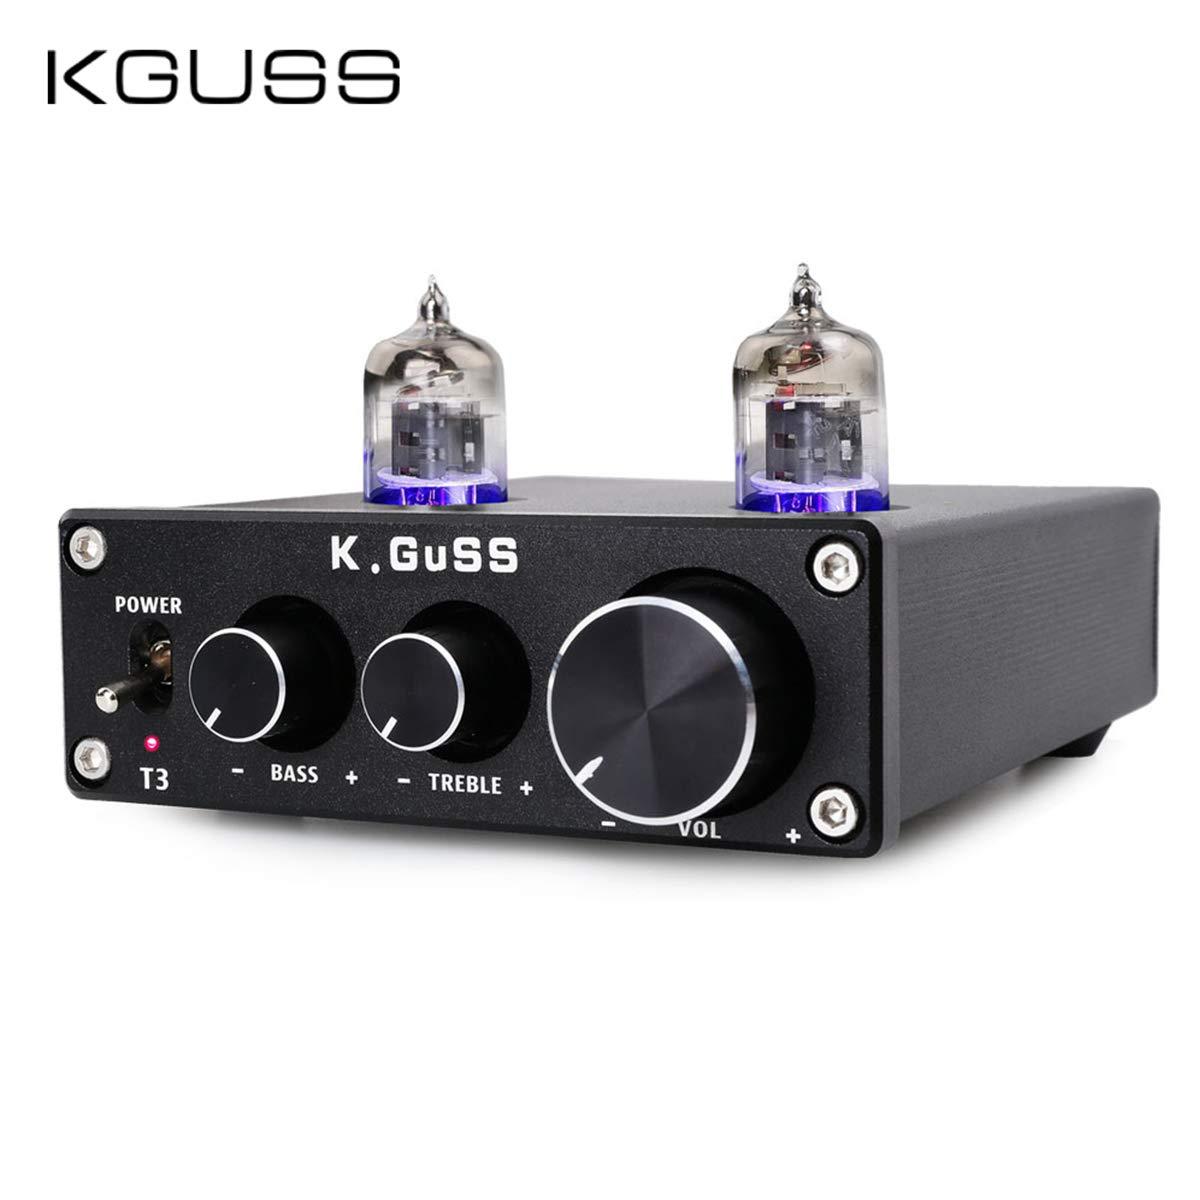 KGUSS T3 Vacuum Tube Mini Bile 6J1 Preamp Tube Amplifier Buffer Tube Amp HiFi Audio Preamplifier Treble & Bass Adjustment Pre-amps DC12V(Black)